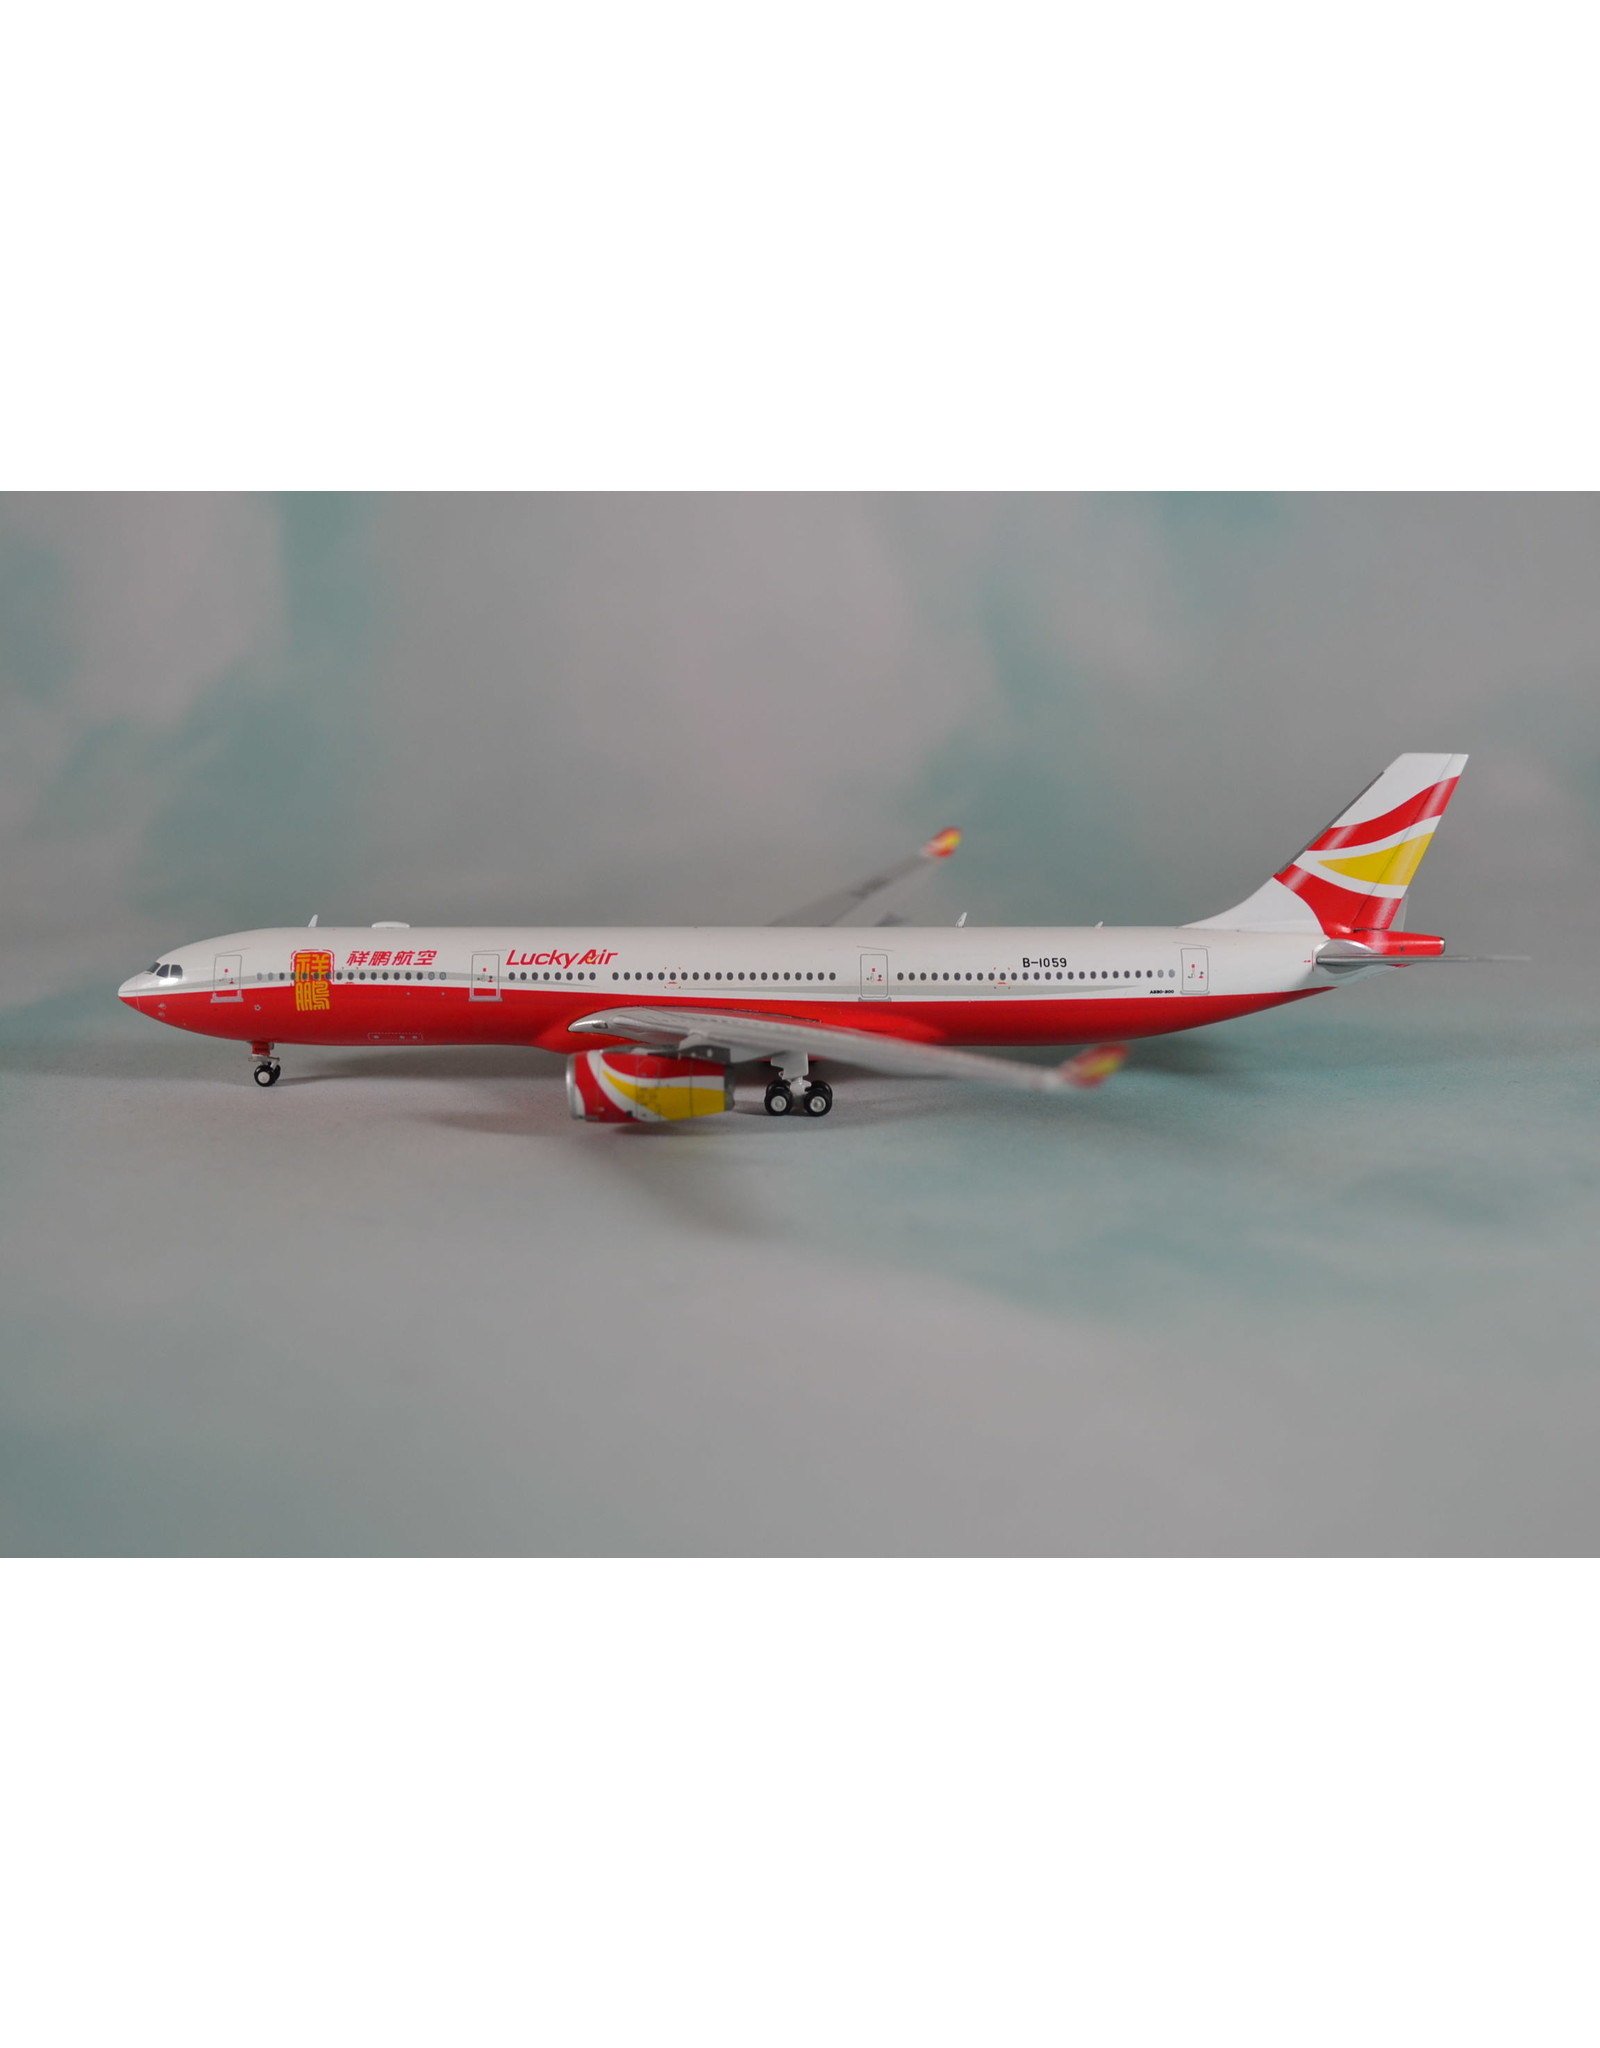 JC Wings JC4 Lucky Air A330-300 B-1059